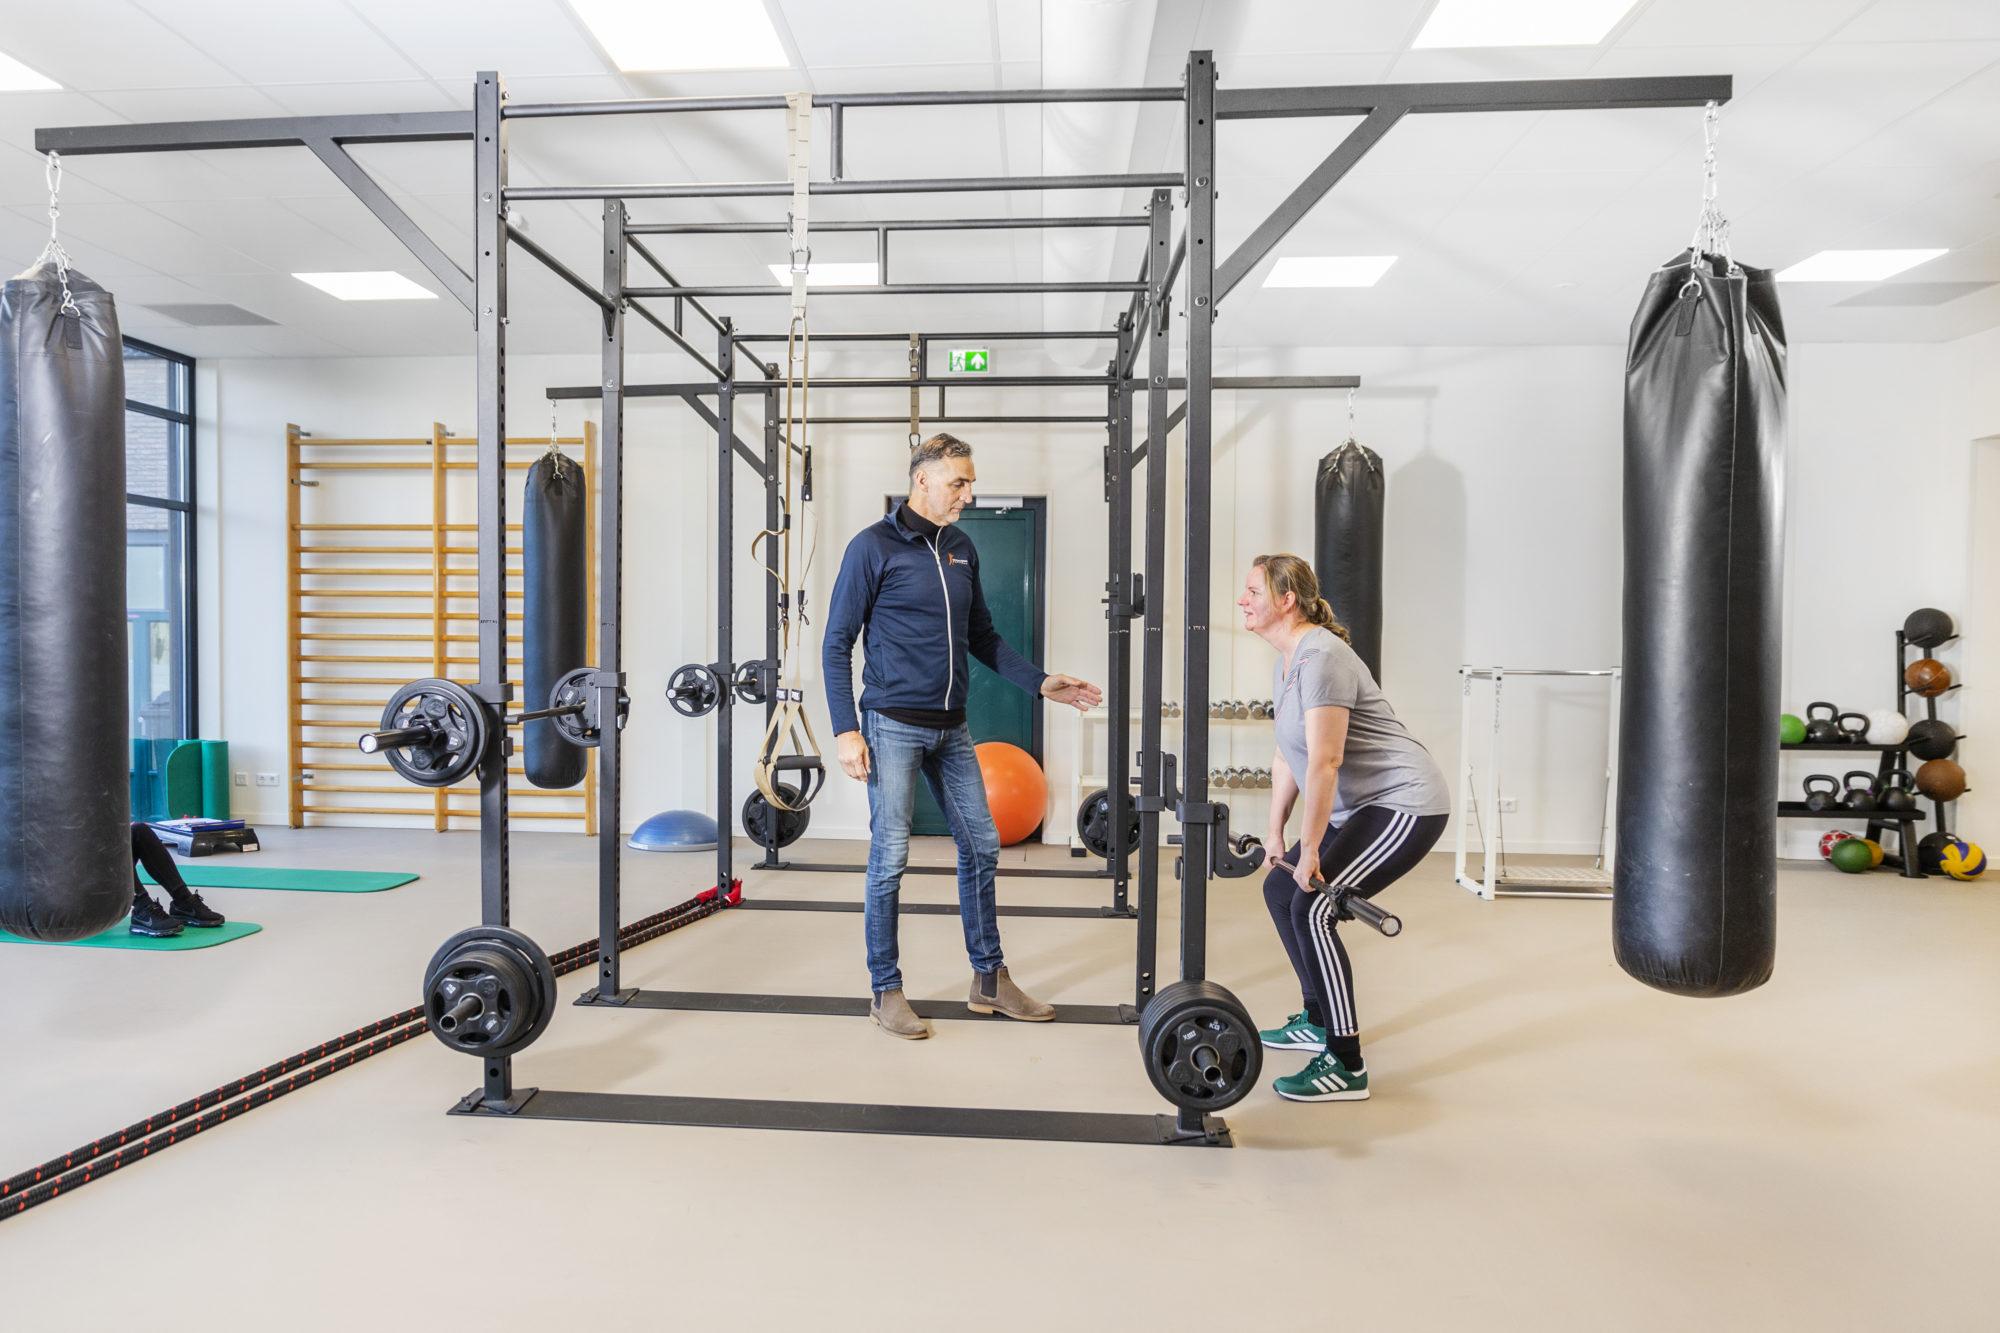 Oefentherapie - SMCP - Nijmegen - sportzaal - gewichten